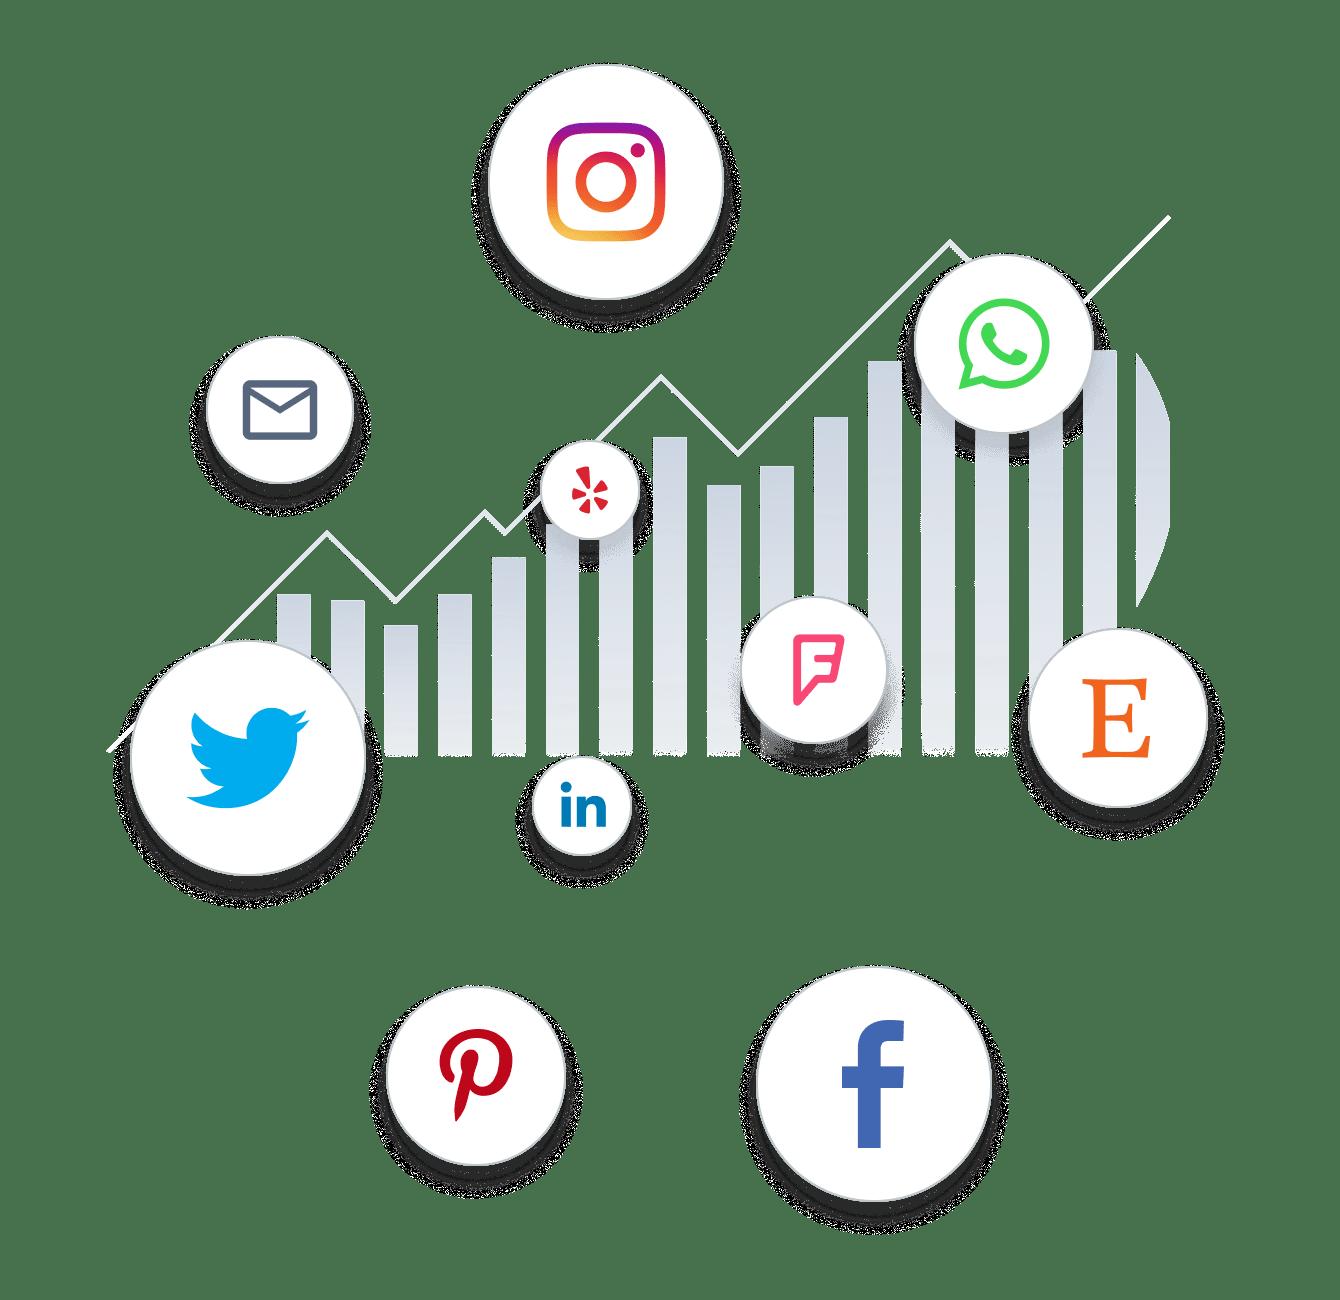 Social media icons for Instagram, Twitter, LinkedIn, Yelp, Facebook, WhatsApp and Pinterest.